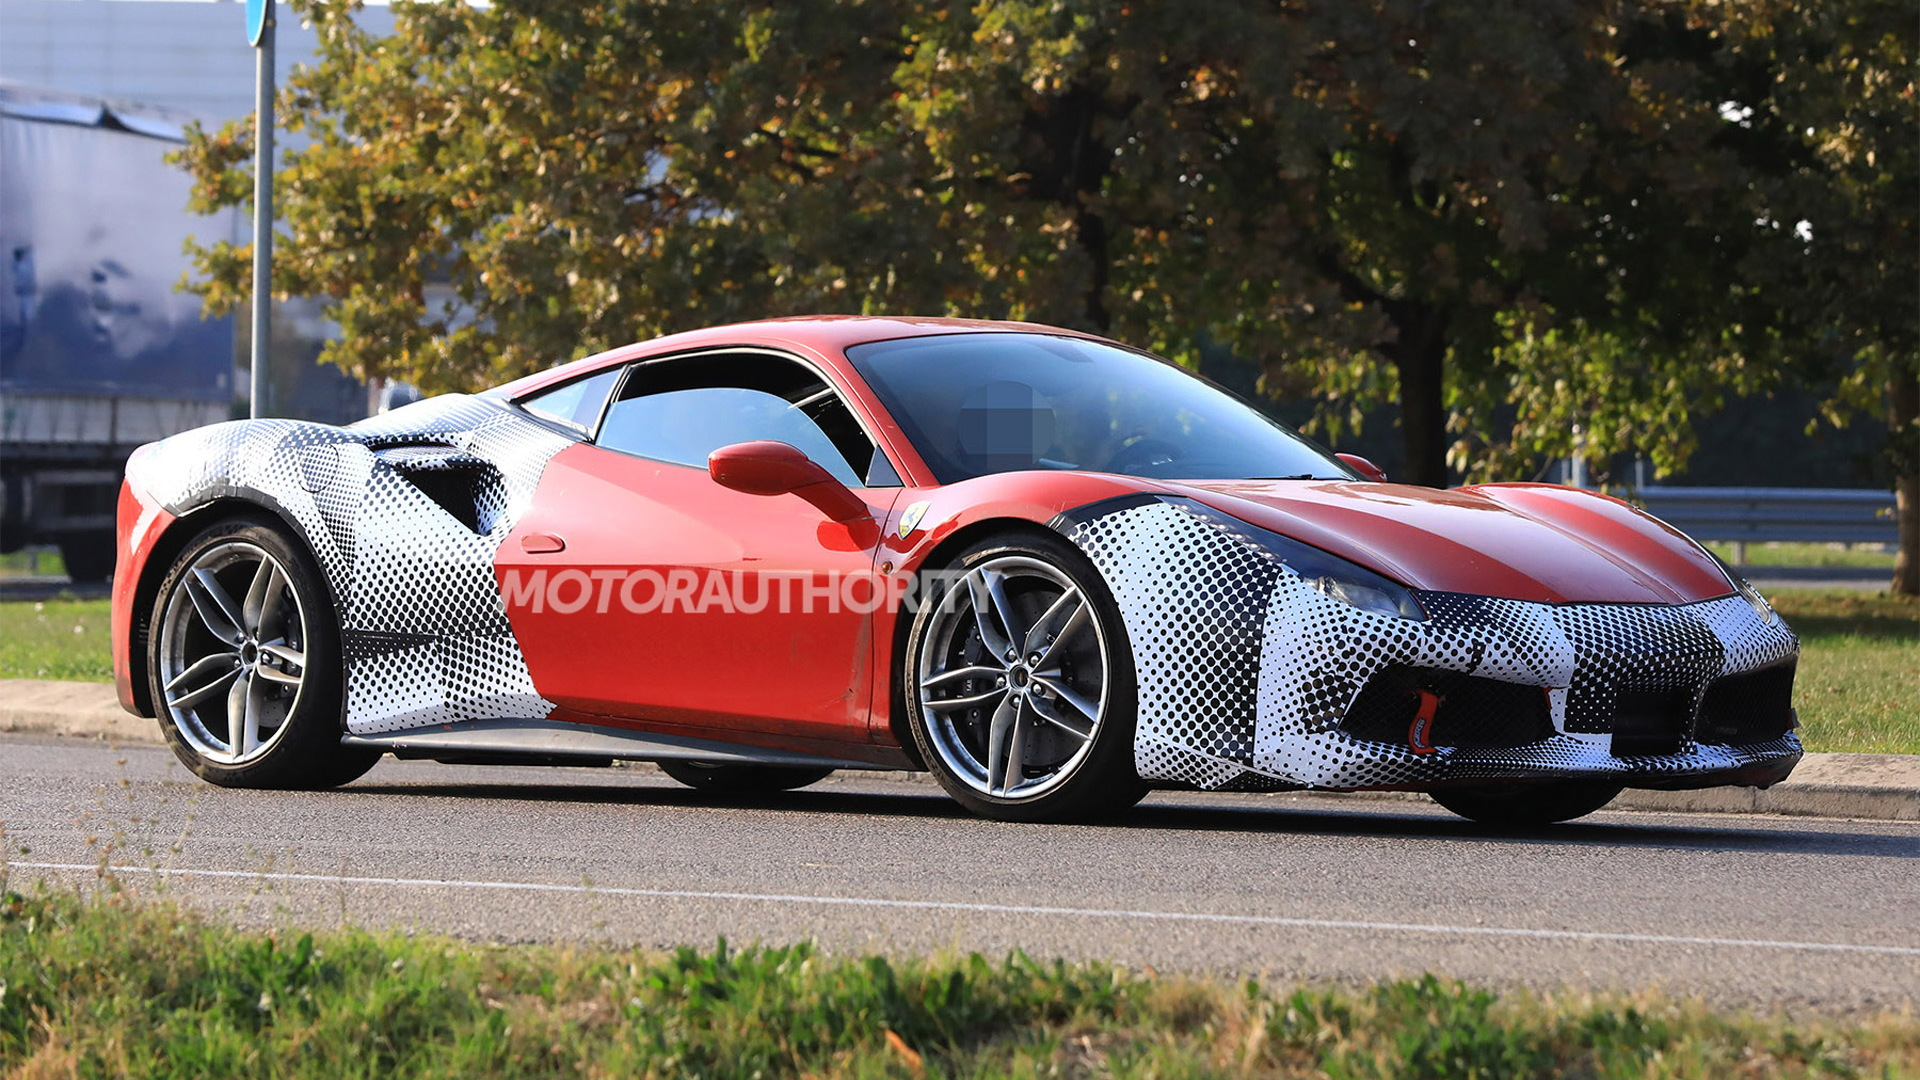 2019 Ferrari 488 GTO spy shots and video